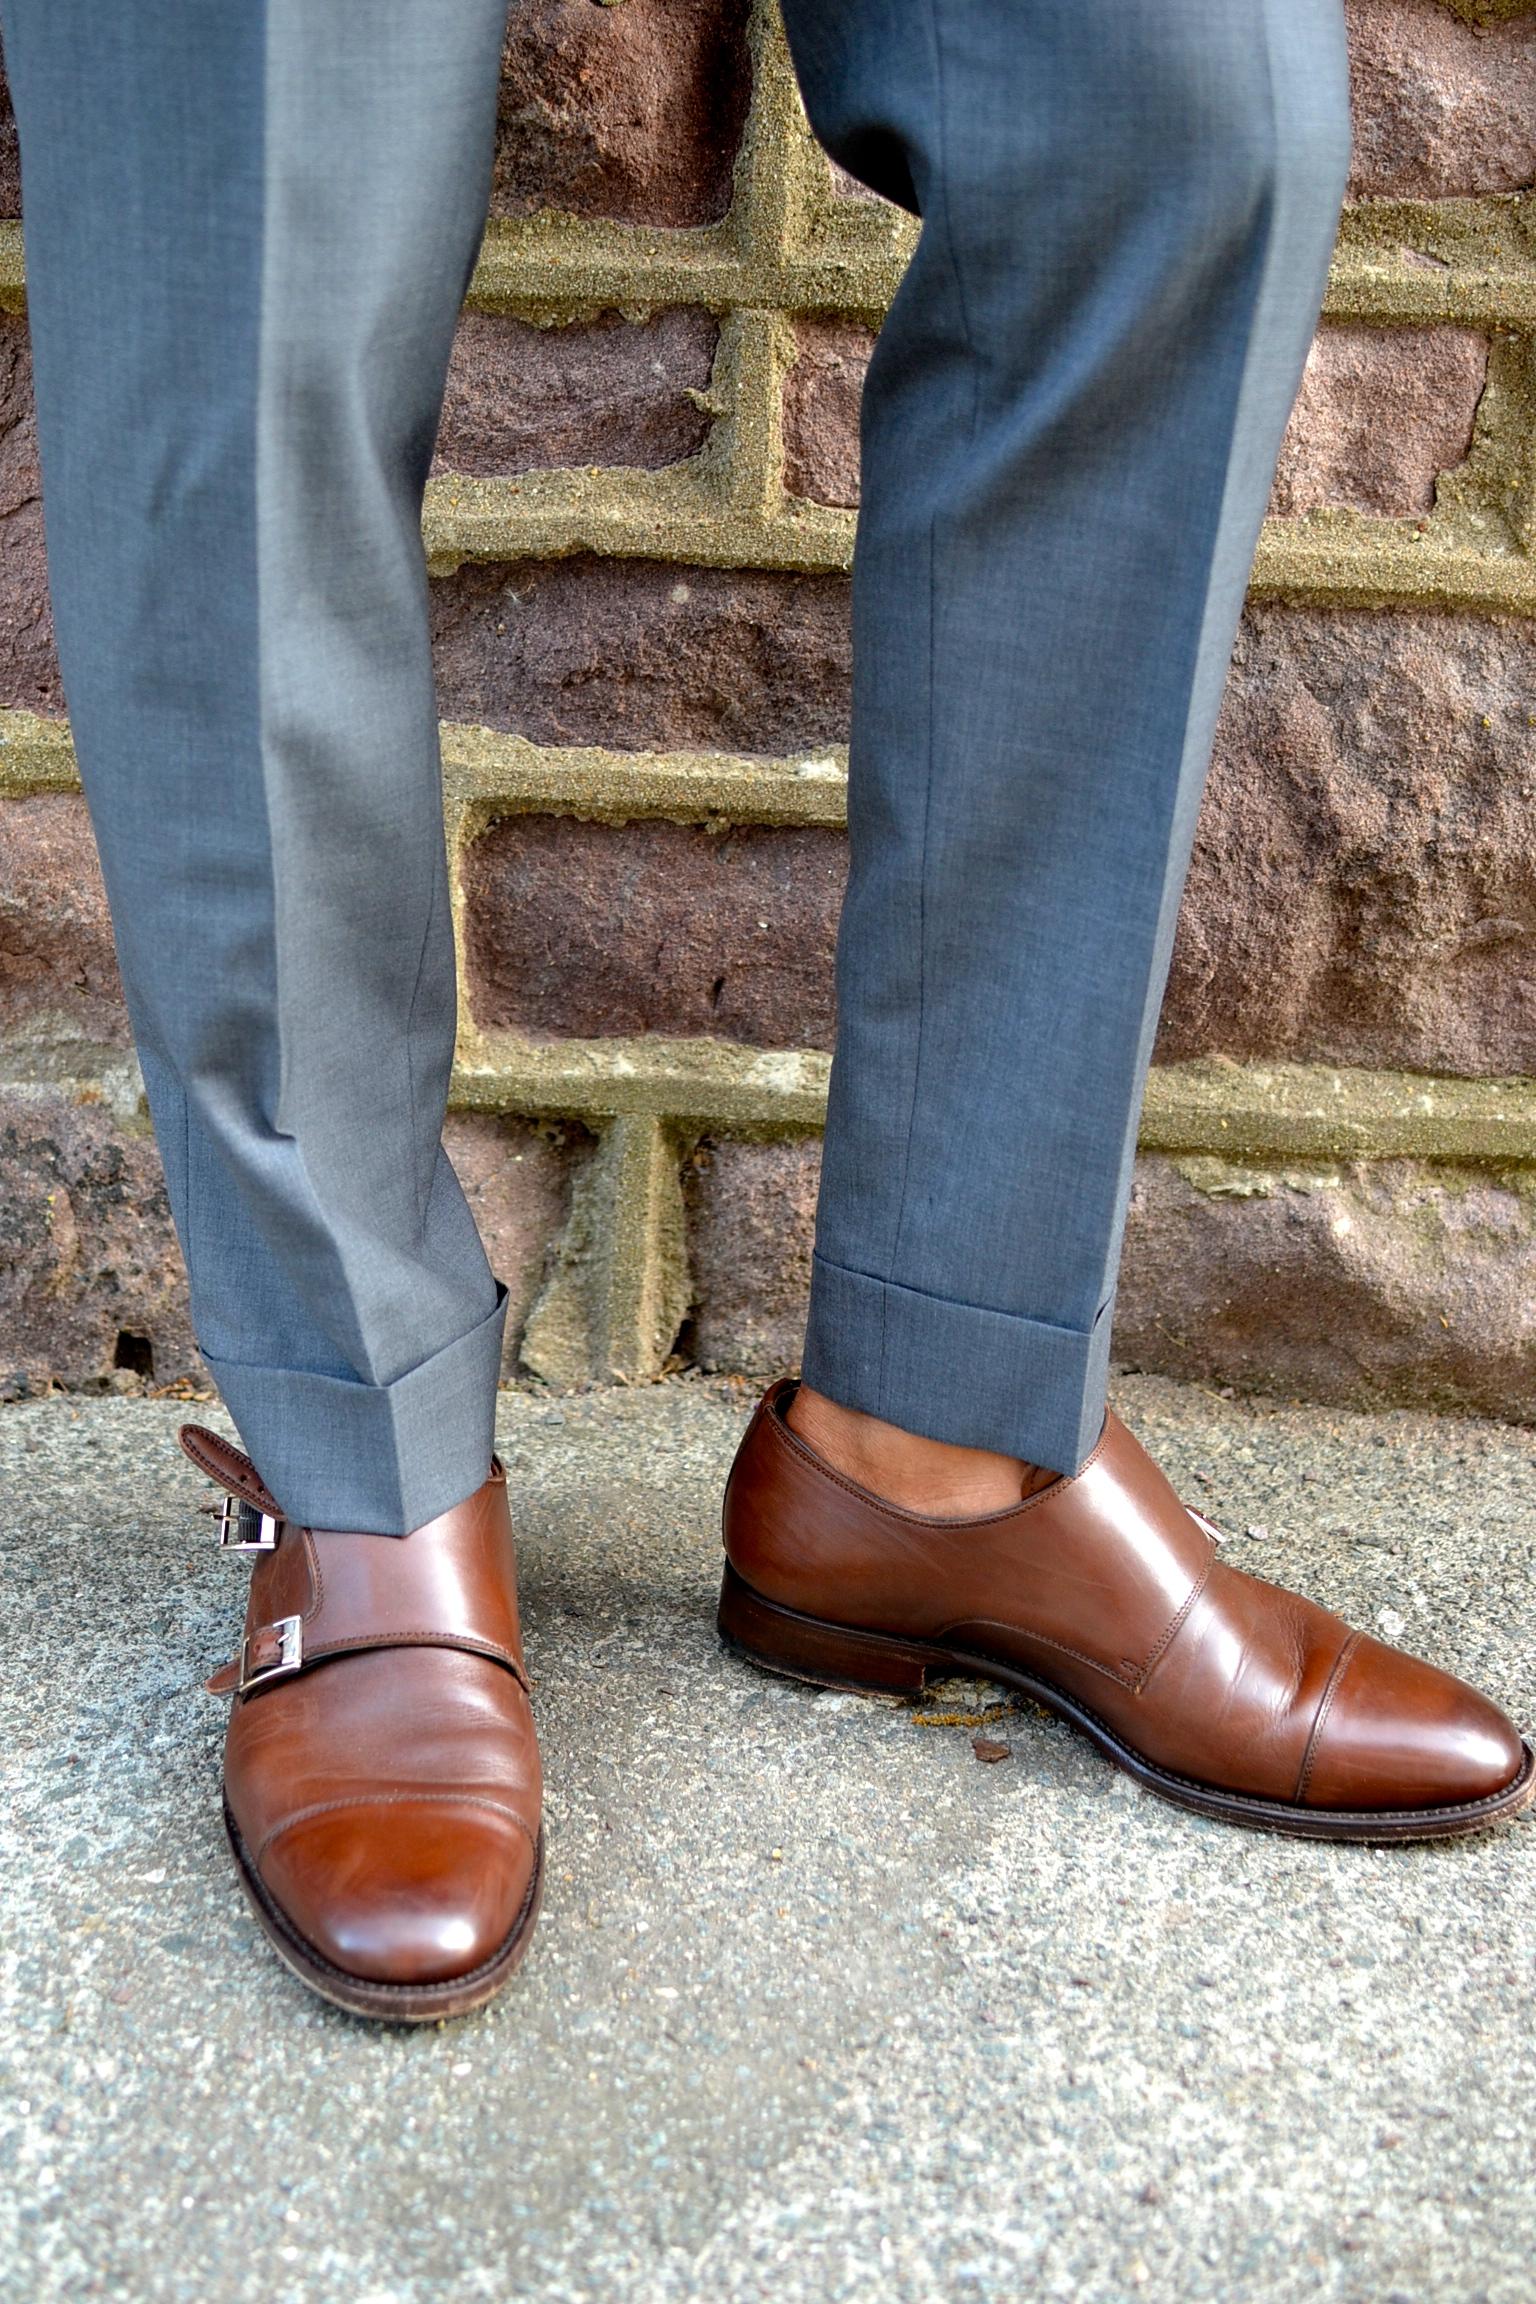 Shoe Passion No. 591 Double Monk Strap on Sabir Peele Of Men's Style Pro